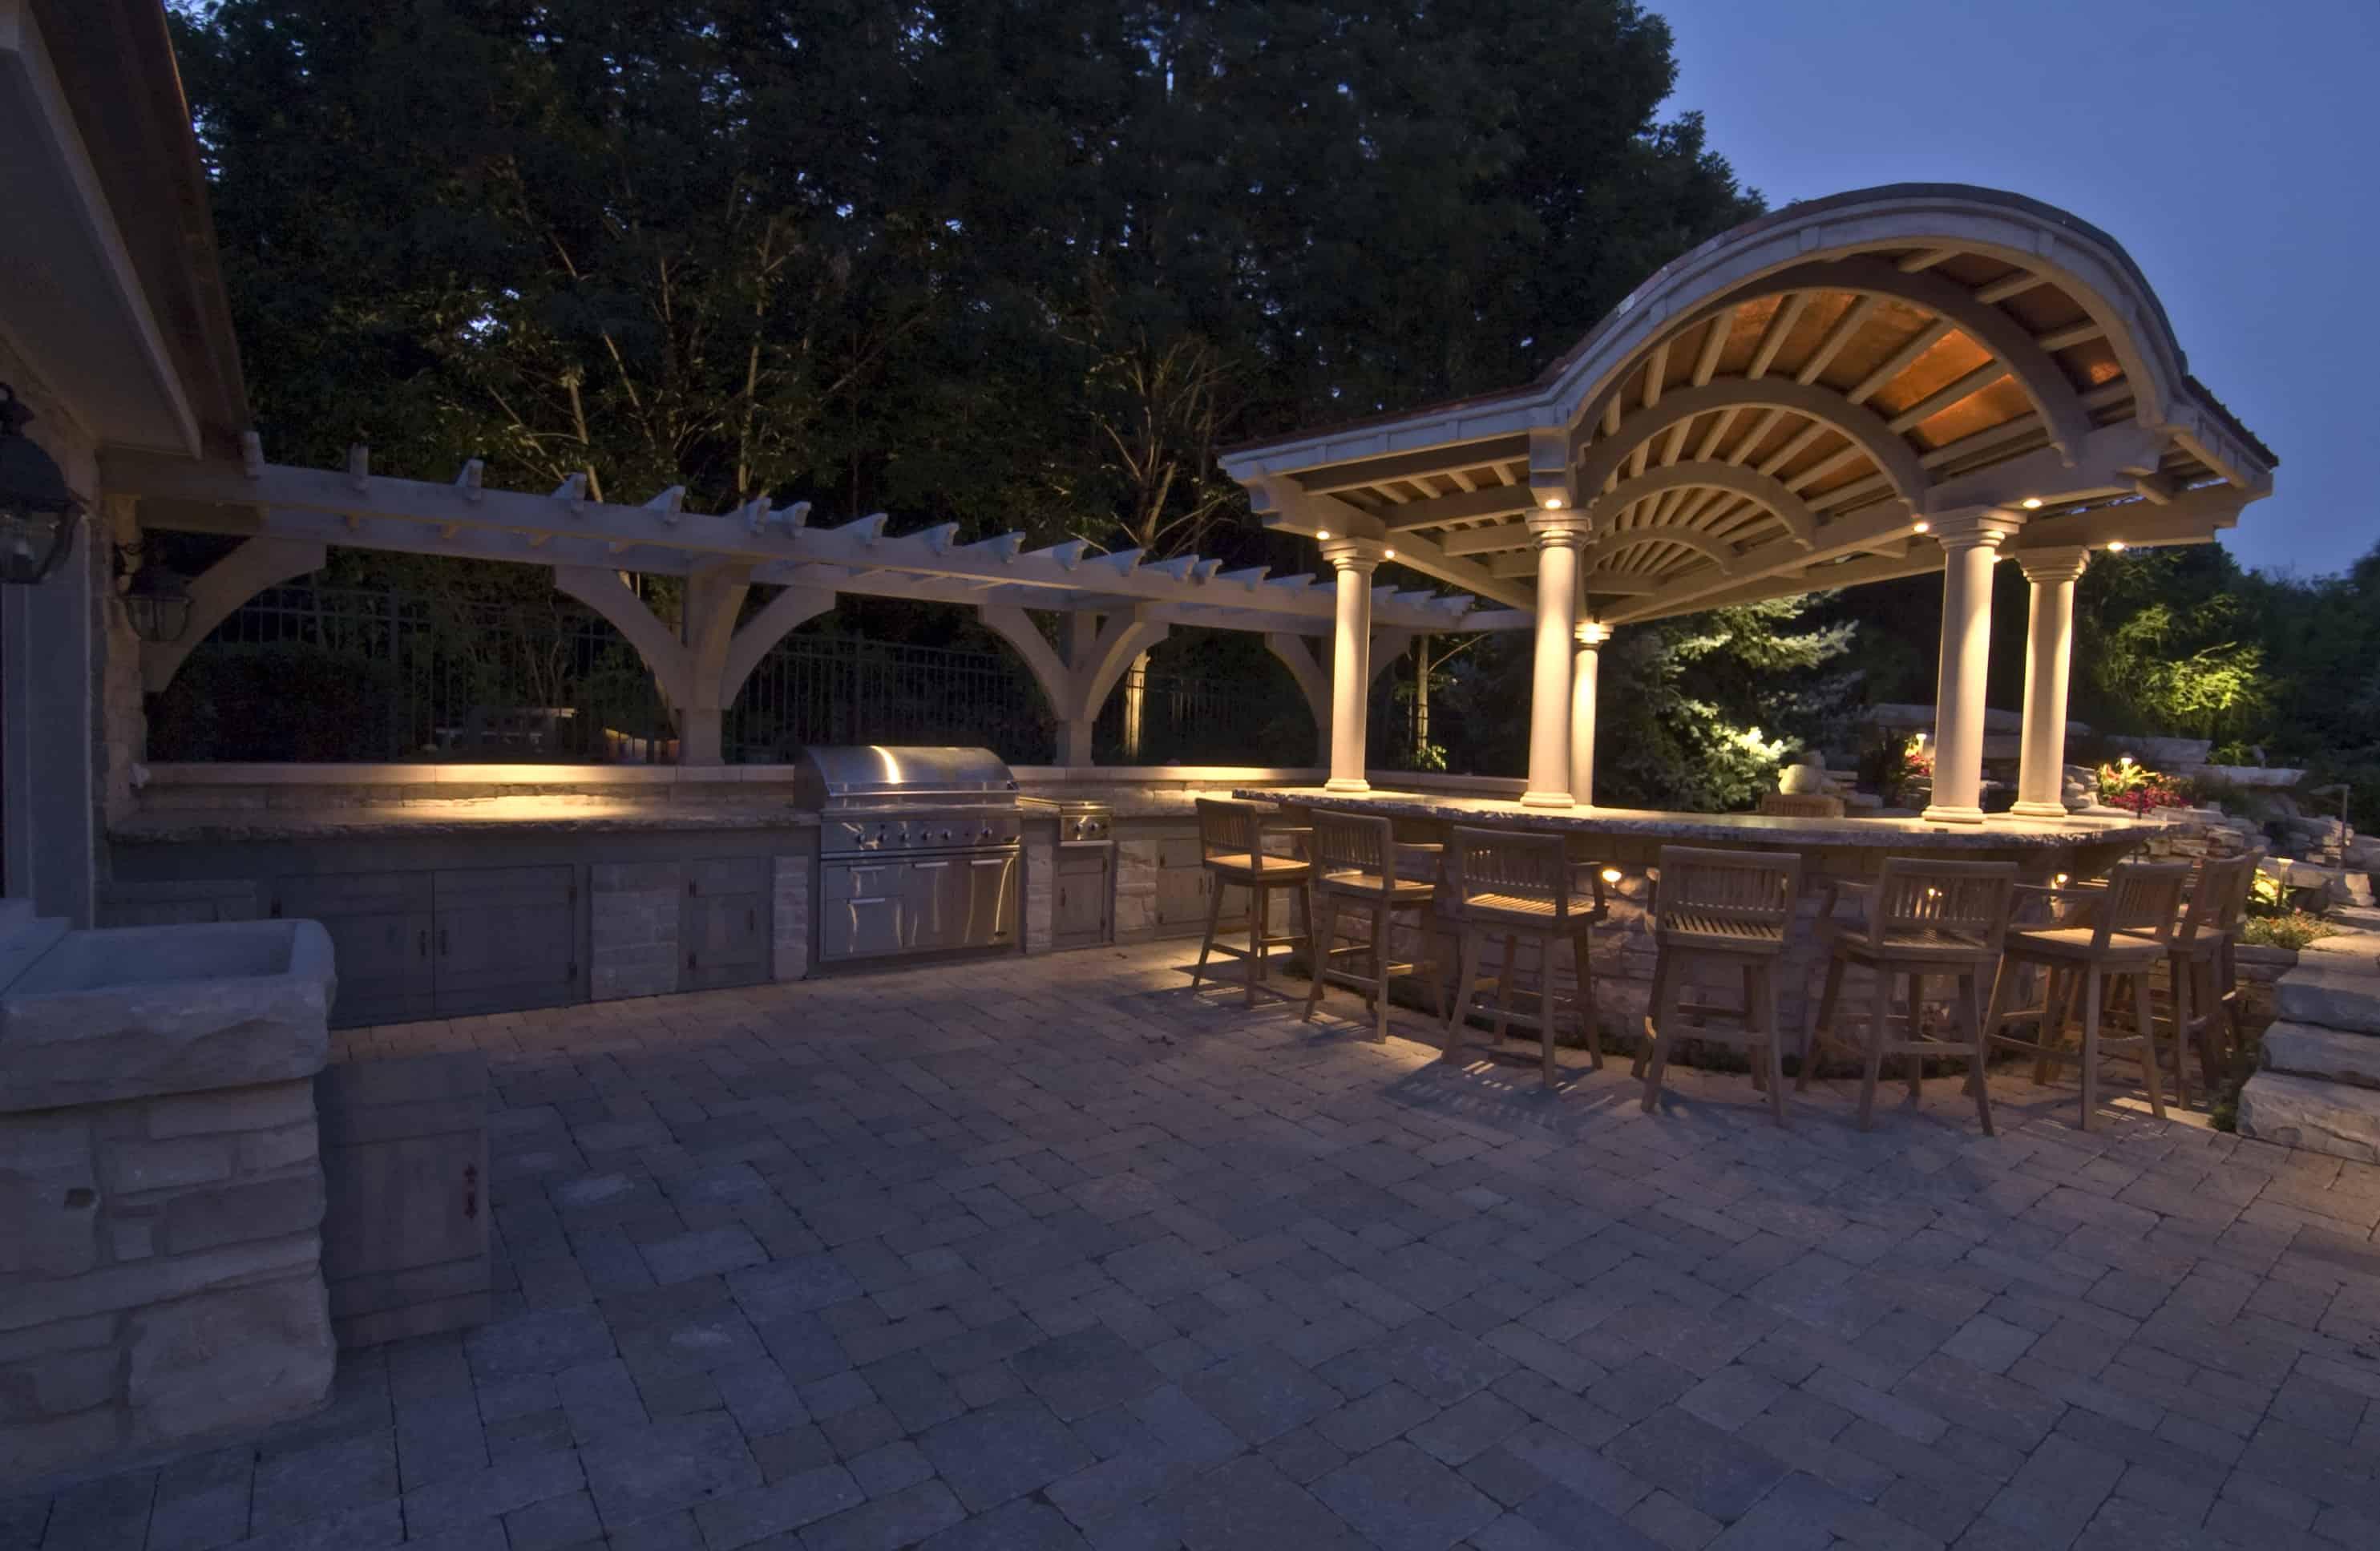 kitchen bars and grills outdoor kitchen lighting Lemont Outdoor Kitchen Lighting